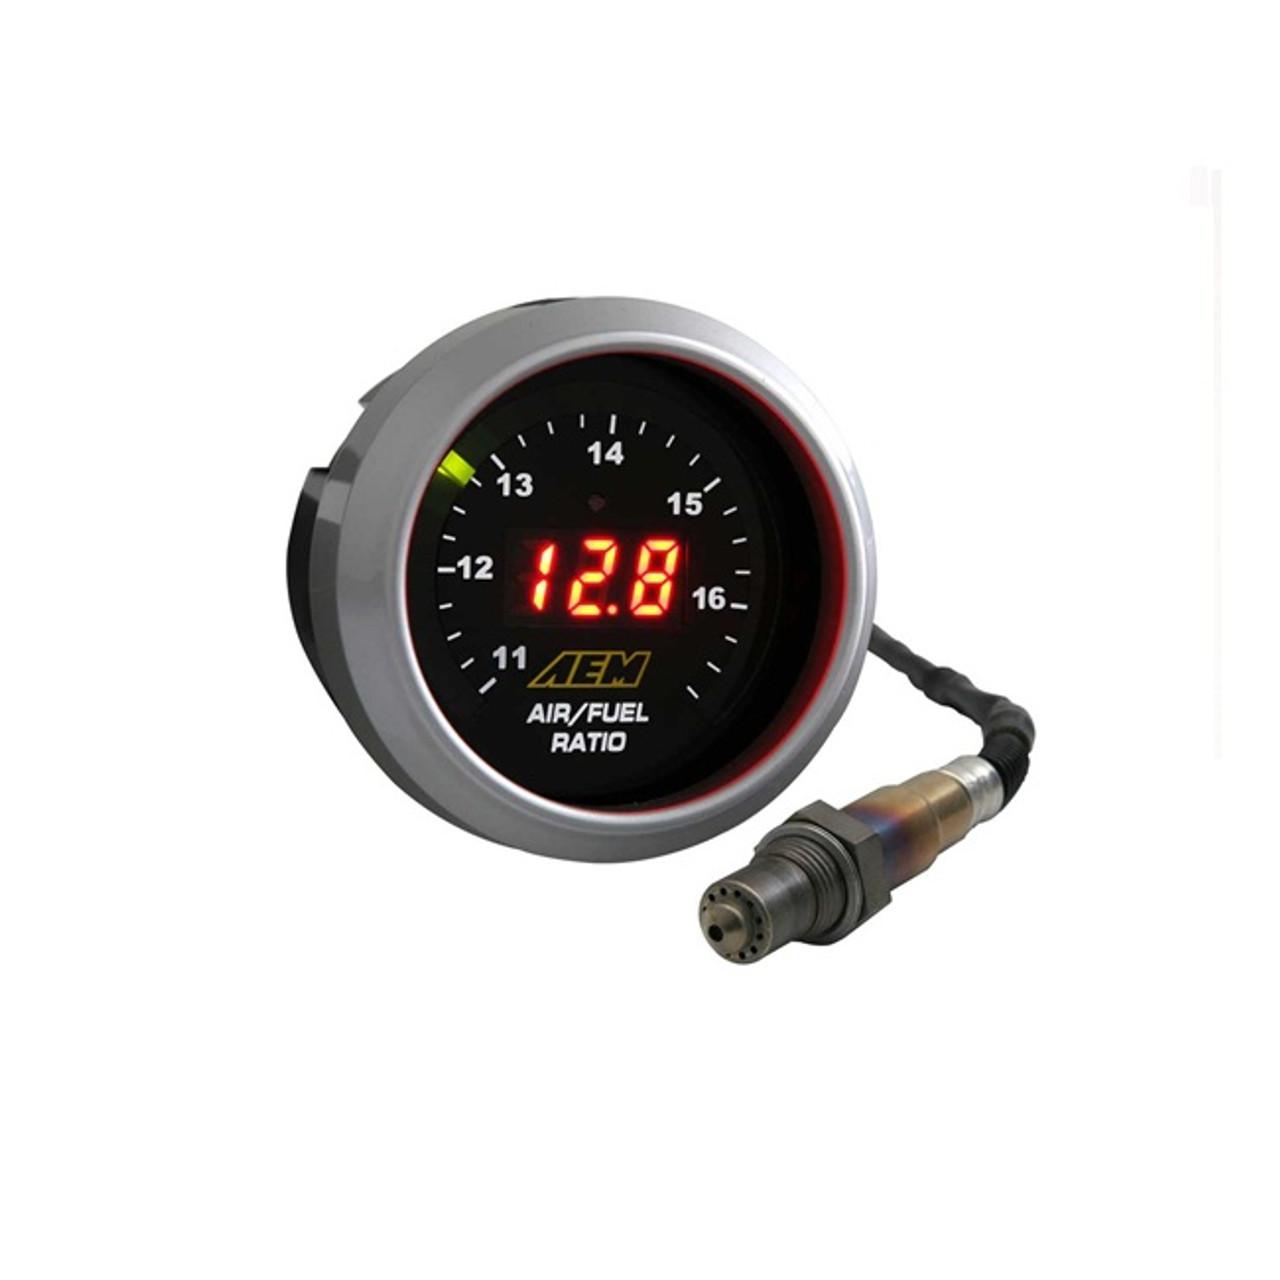 2 x Digital O2 Uego Air Fuel Ratio Gauge Kit Exhaust Gas Temperature Gauge